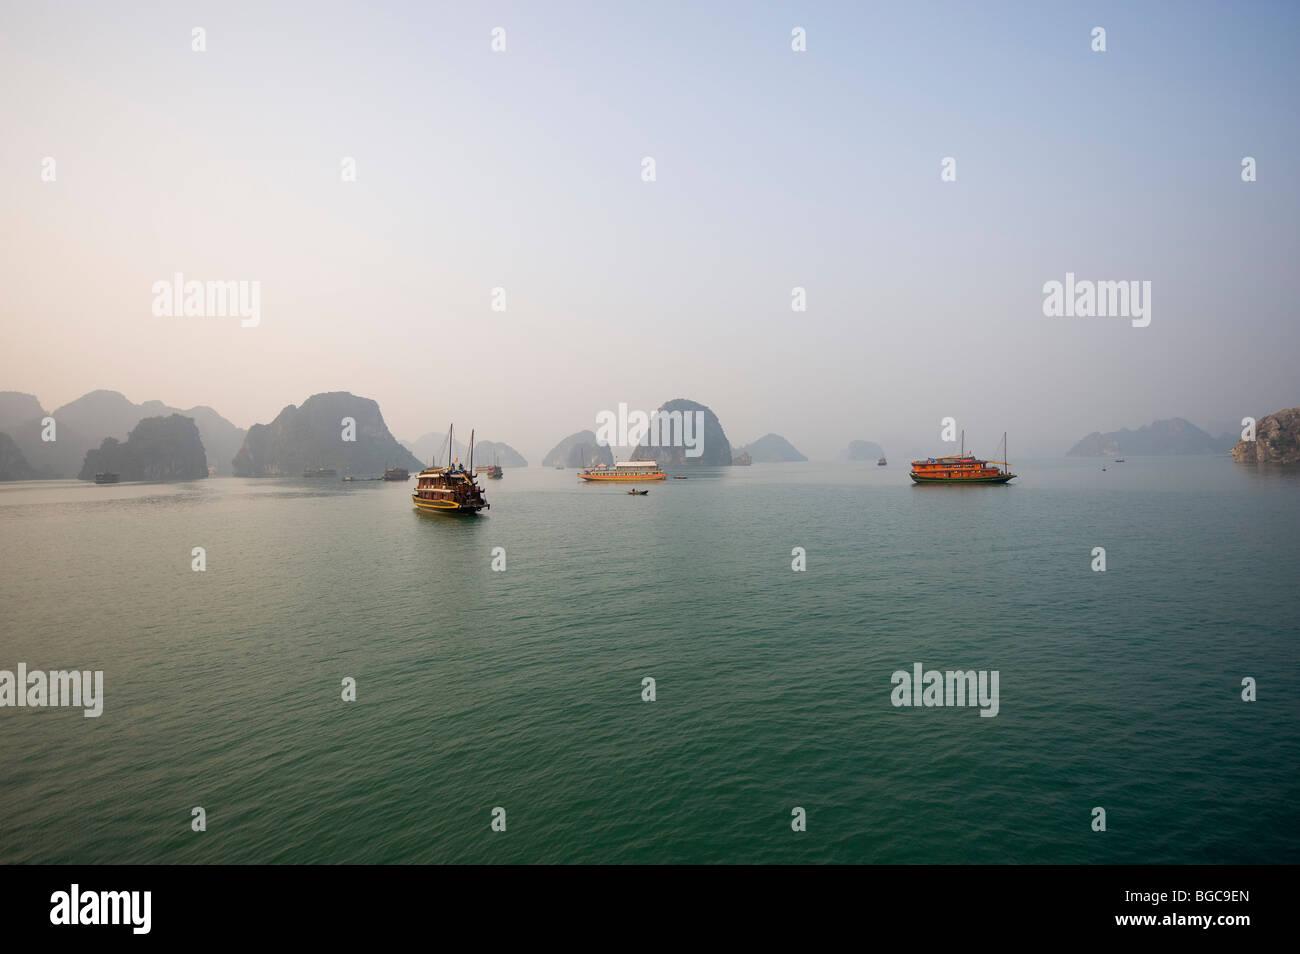 Halong Bay, Vietnam - Stock Image